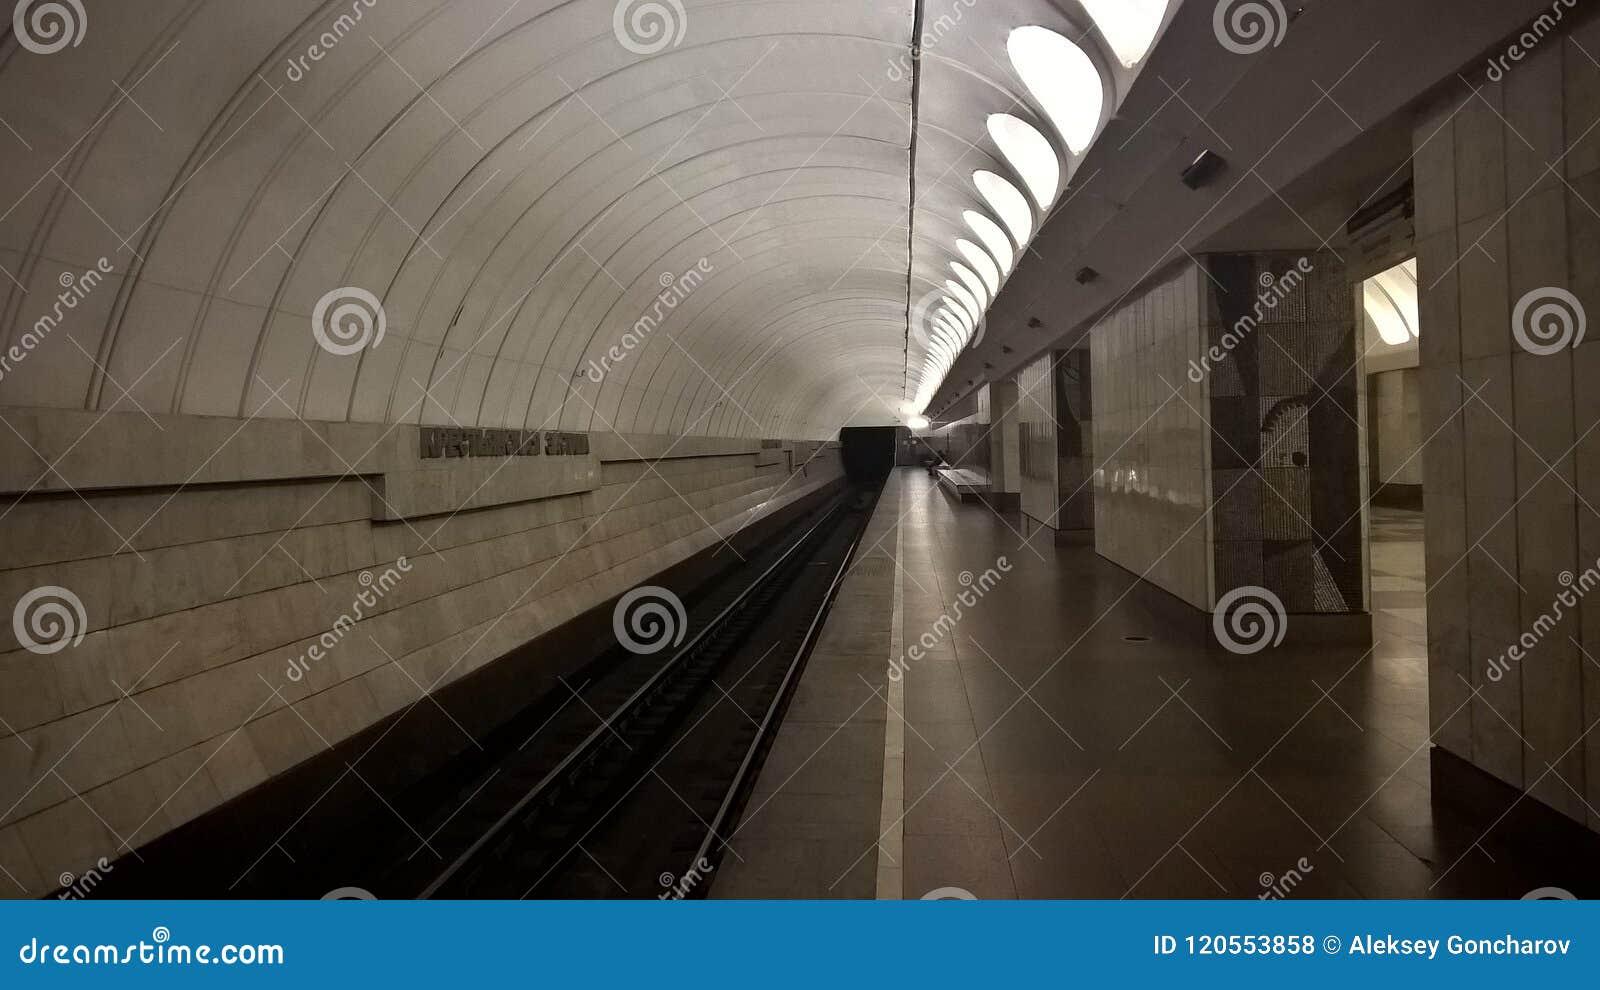 Moskwa, Rosja, metropolita, ` Krestyanskaya Zastava ` stacja metru, Peron na staci metru